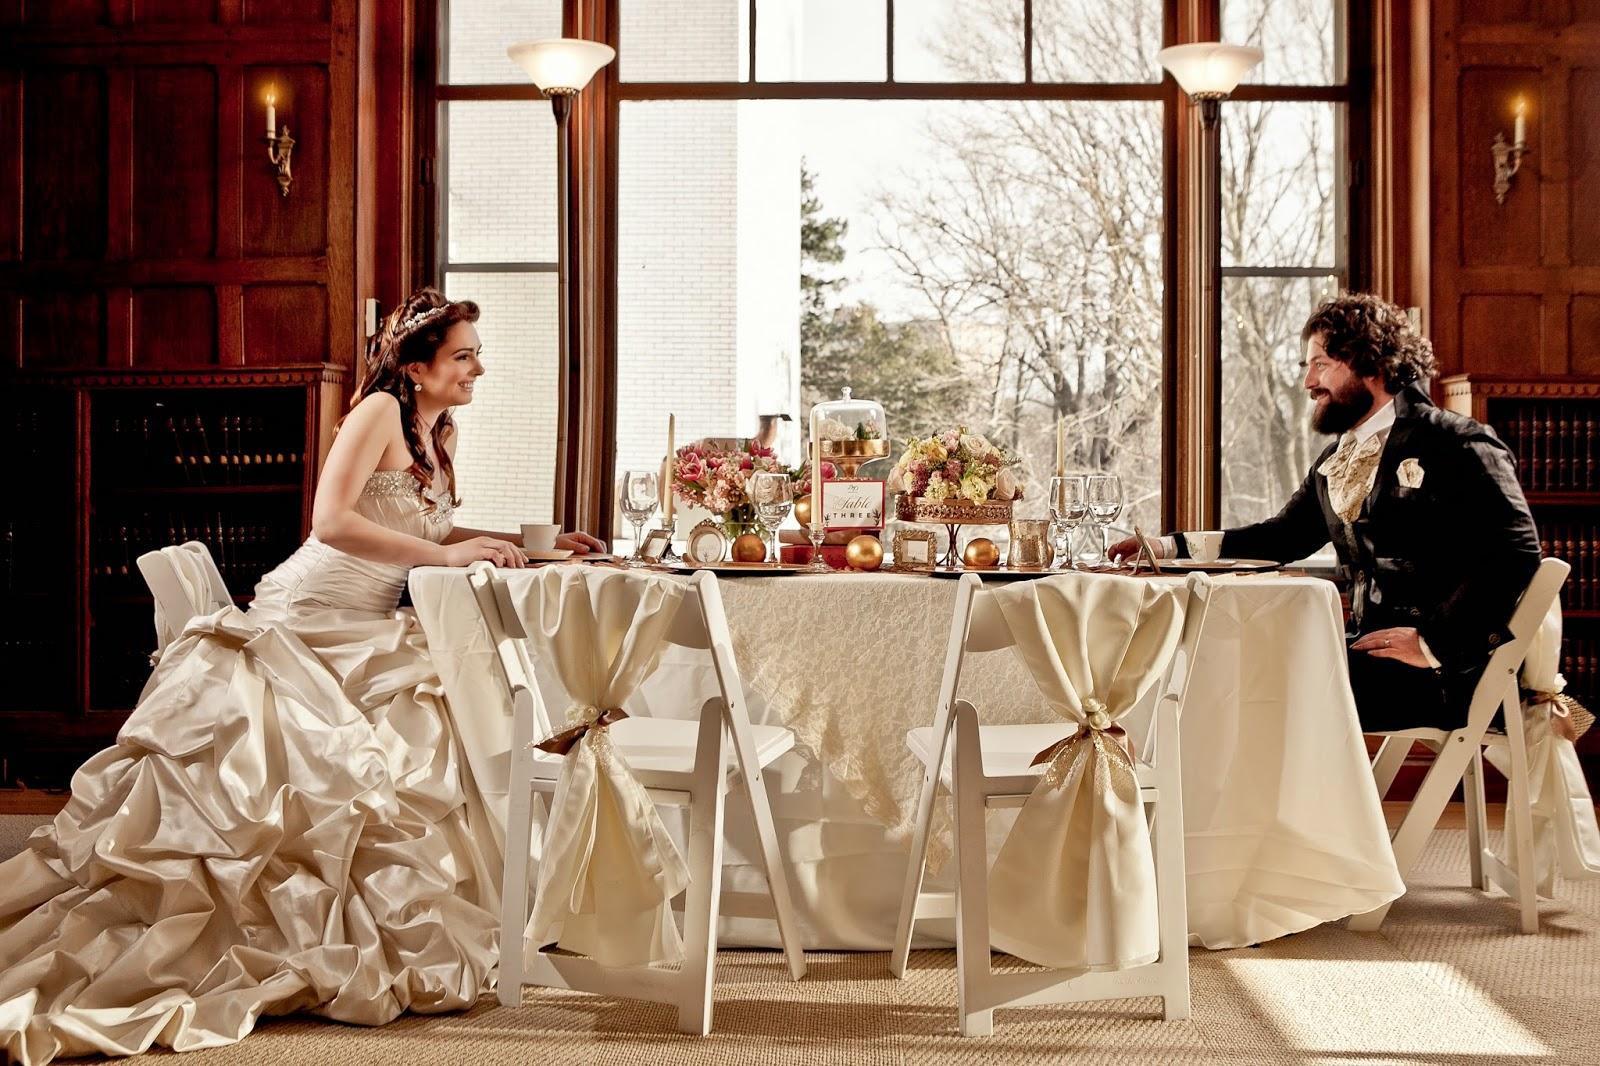 Beauty U0026 The Beast Wedding Inspiration   Princess Series { AvantGarde  Design   CT Wedding Invitations}